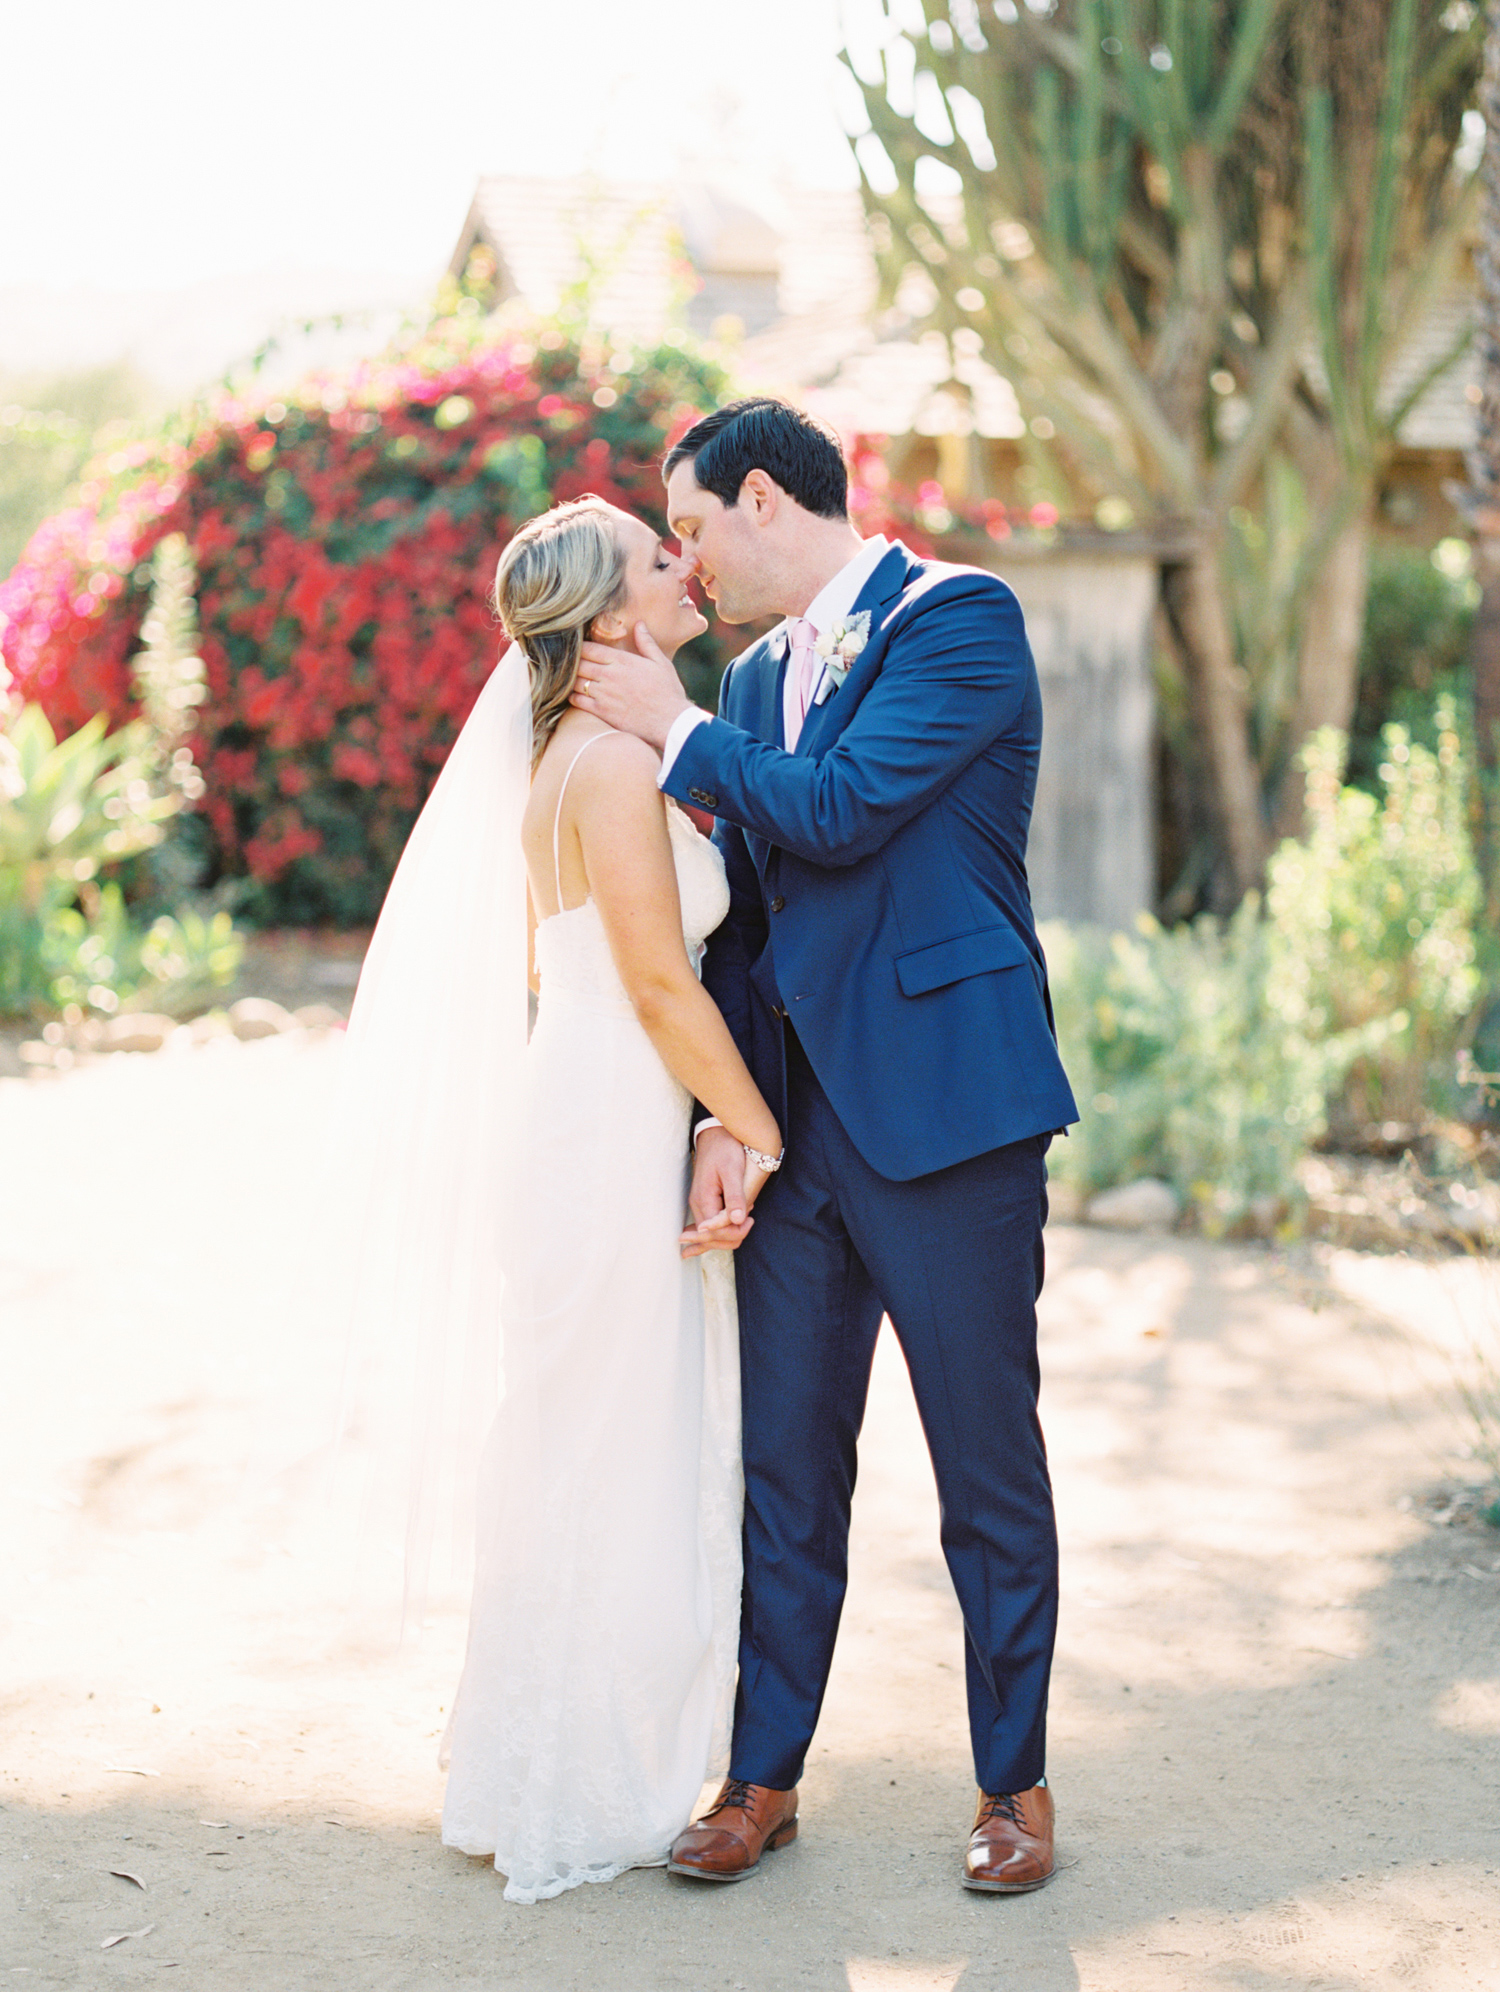 066-Jen-Wojcik-Photography-San-Diego-Wedding-Photographer.jpg